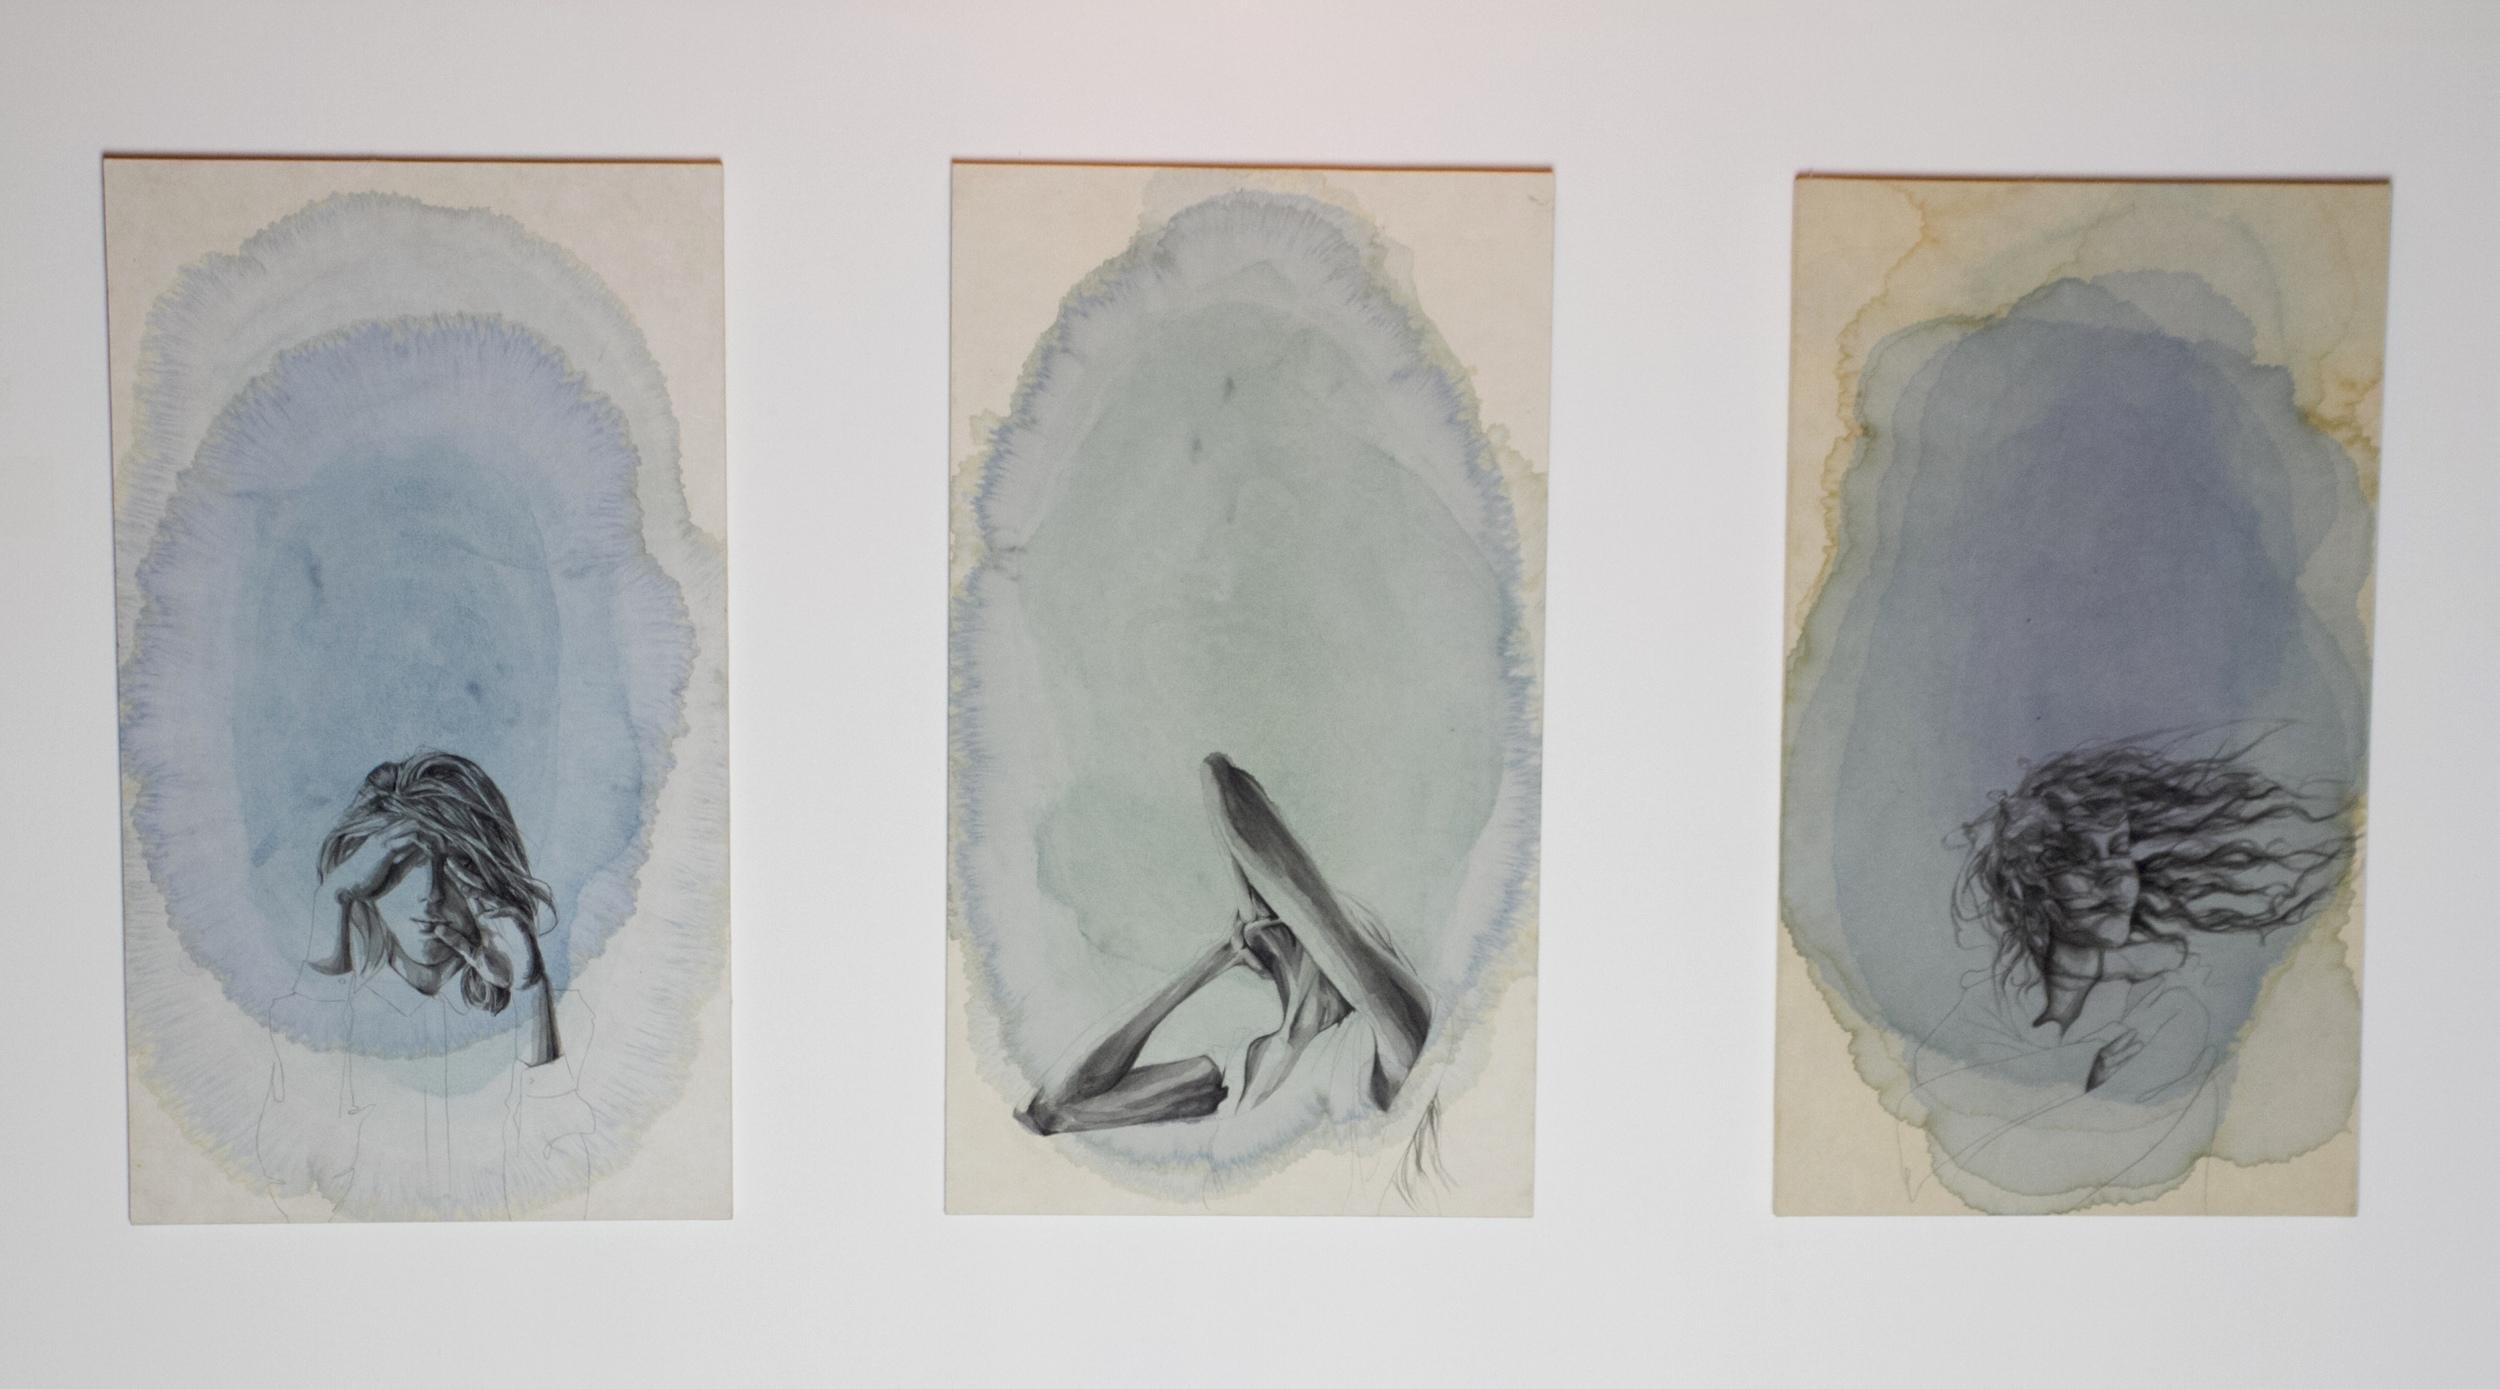 Deep Waters  by Laura Short and Joanna Ahlman